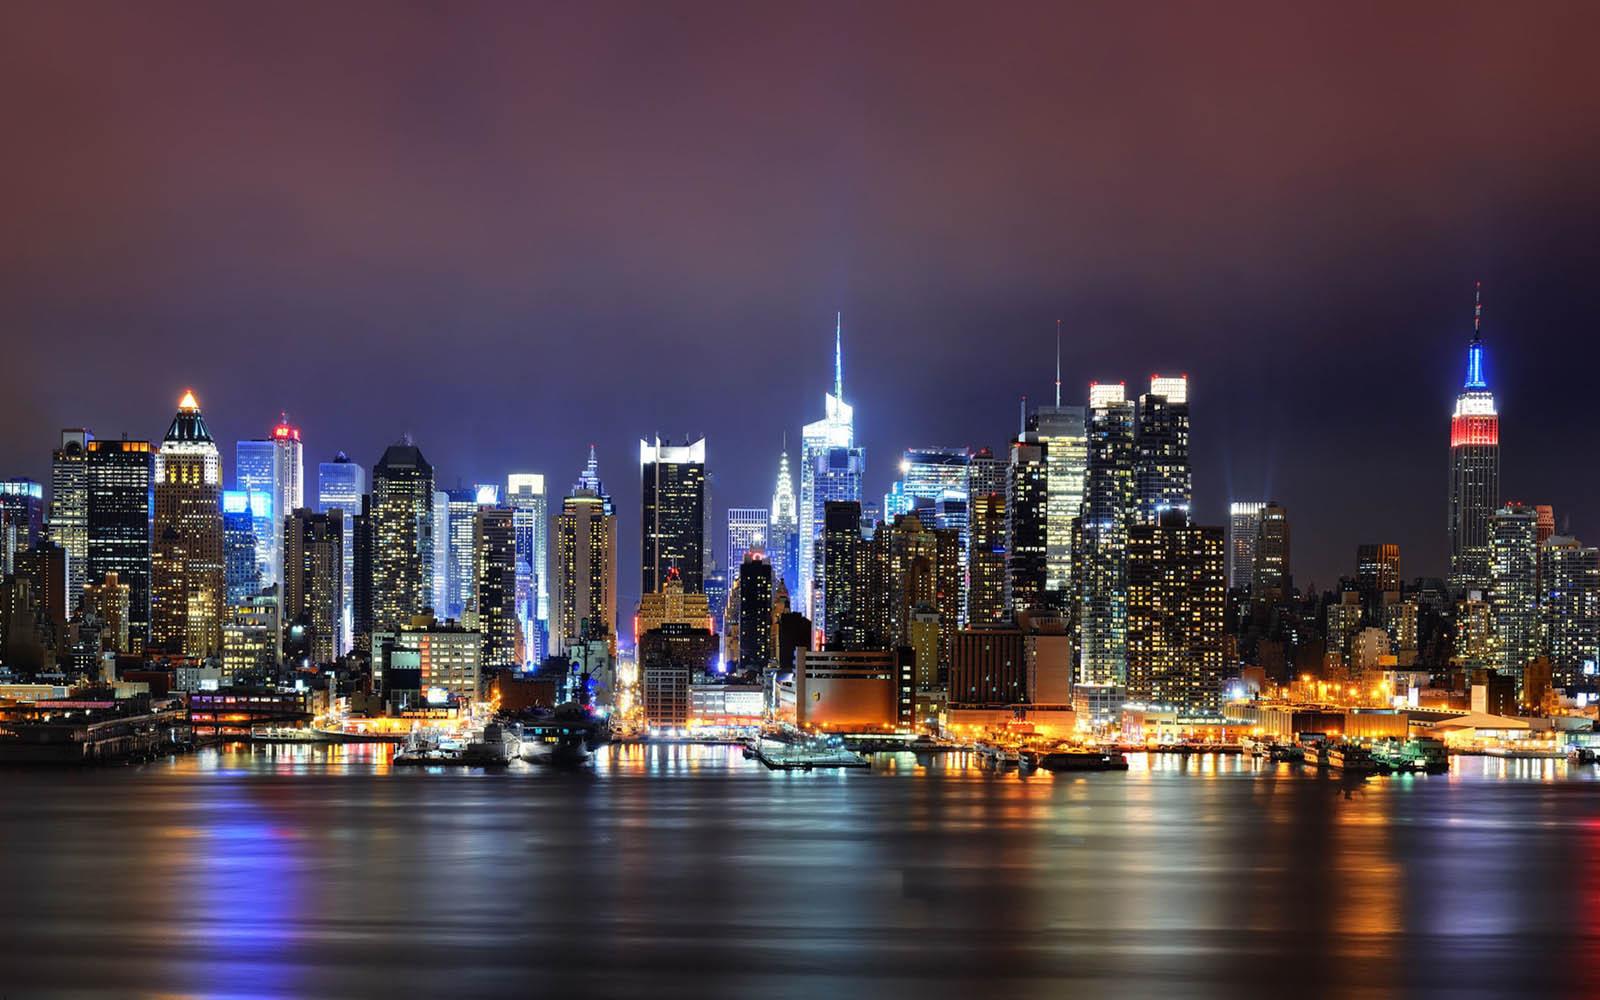 New-York-City-Wallpaper-HD